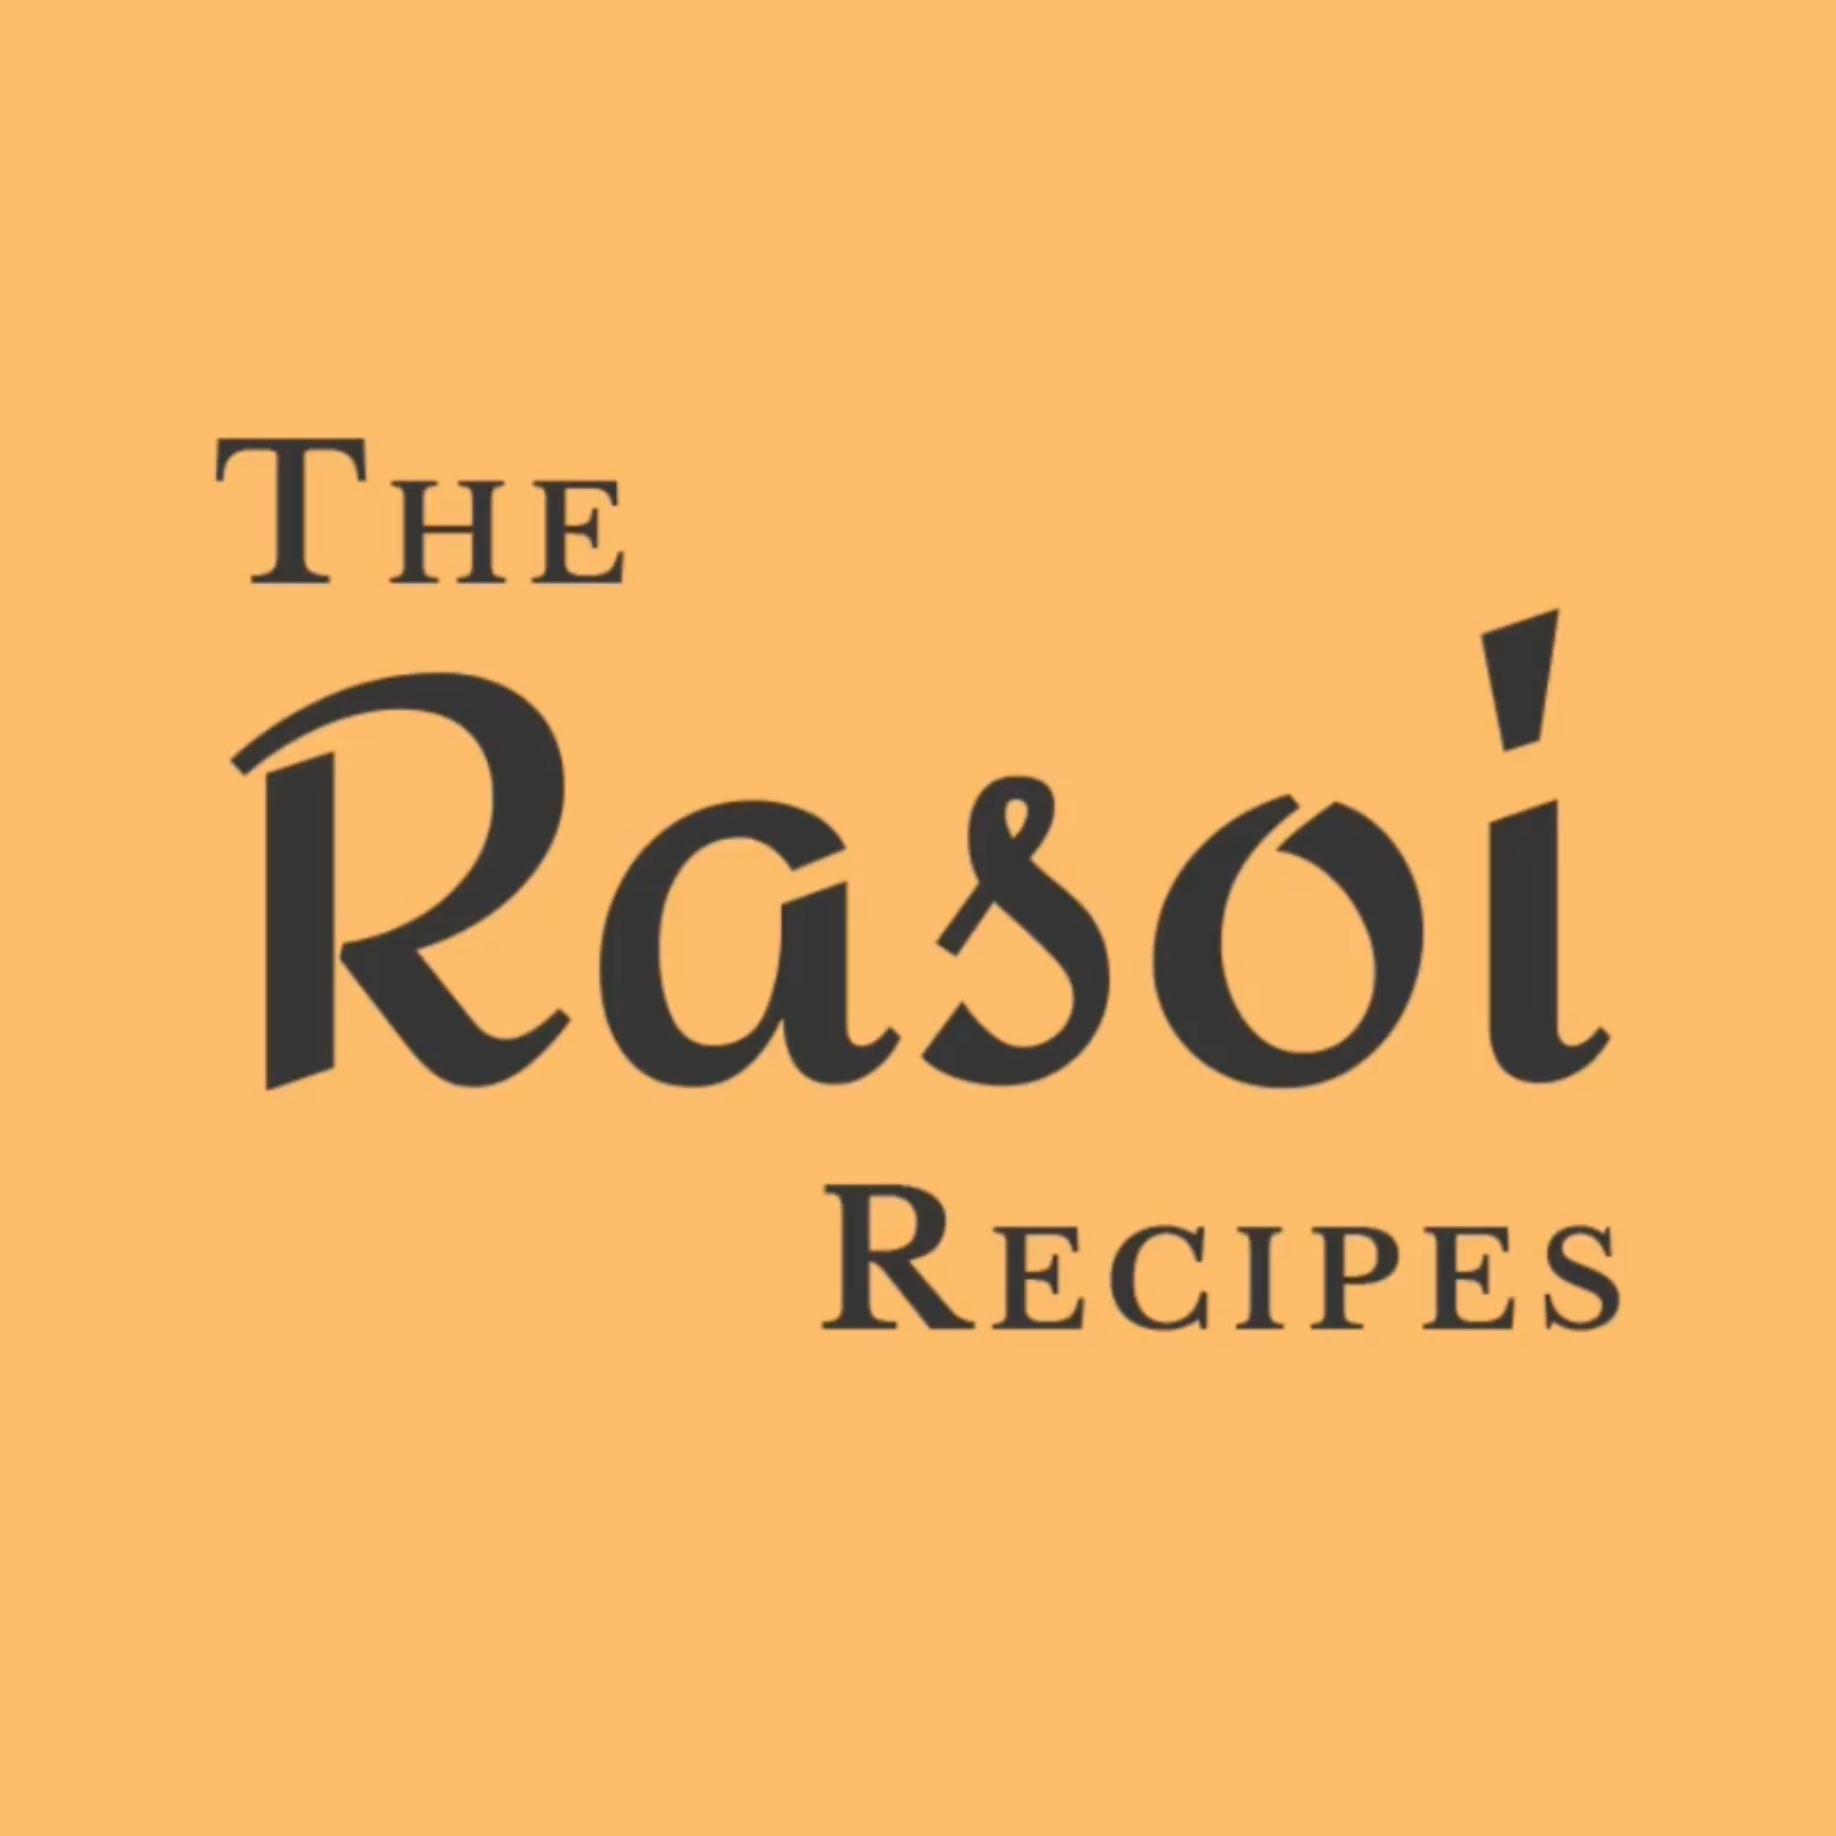 Image of Dashrath from The Rasoi Recipes